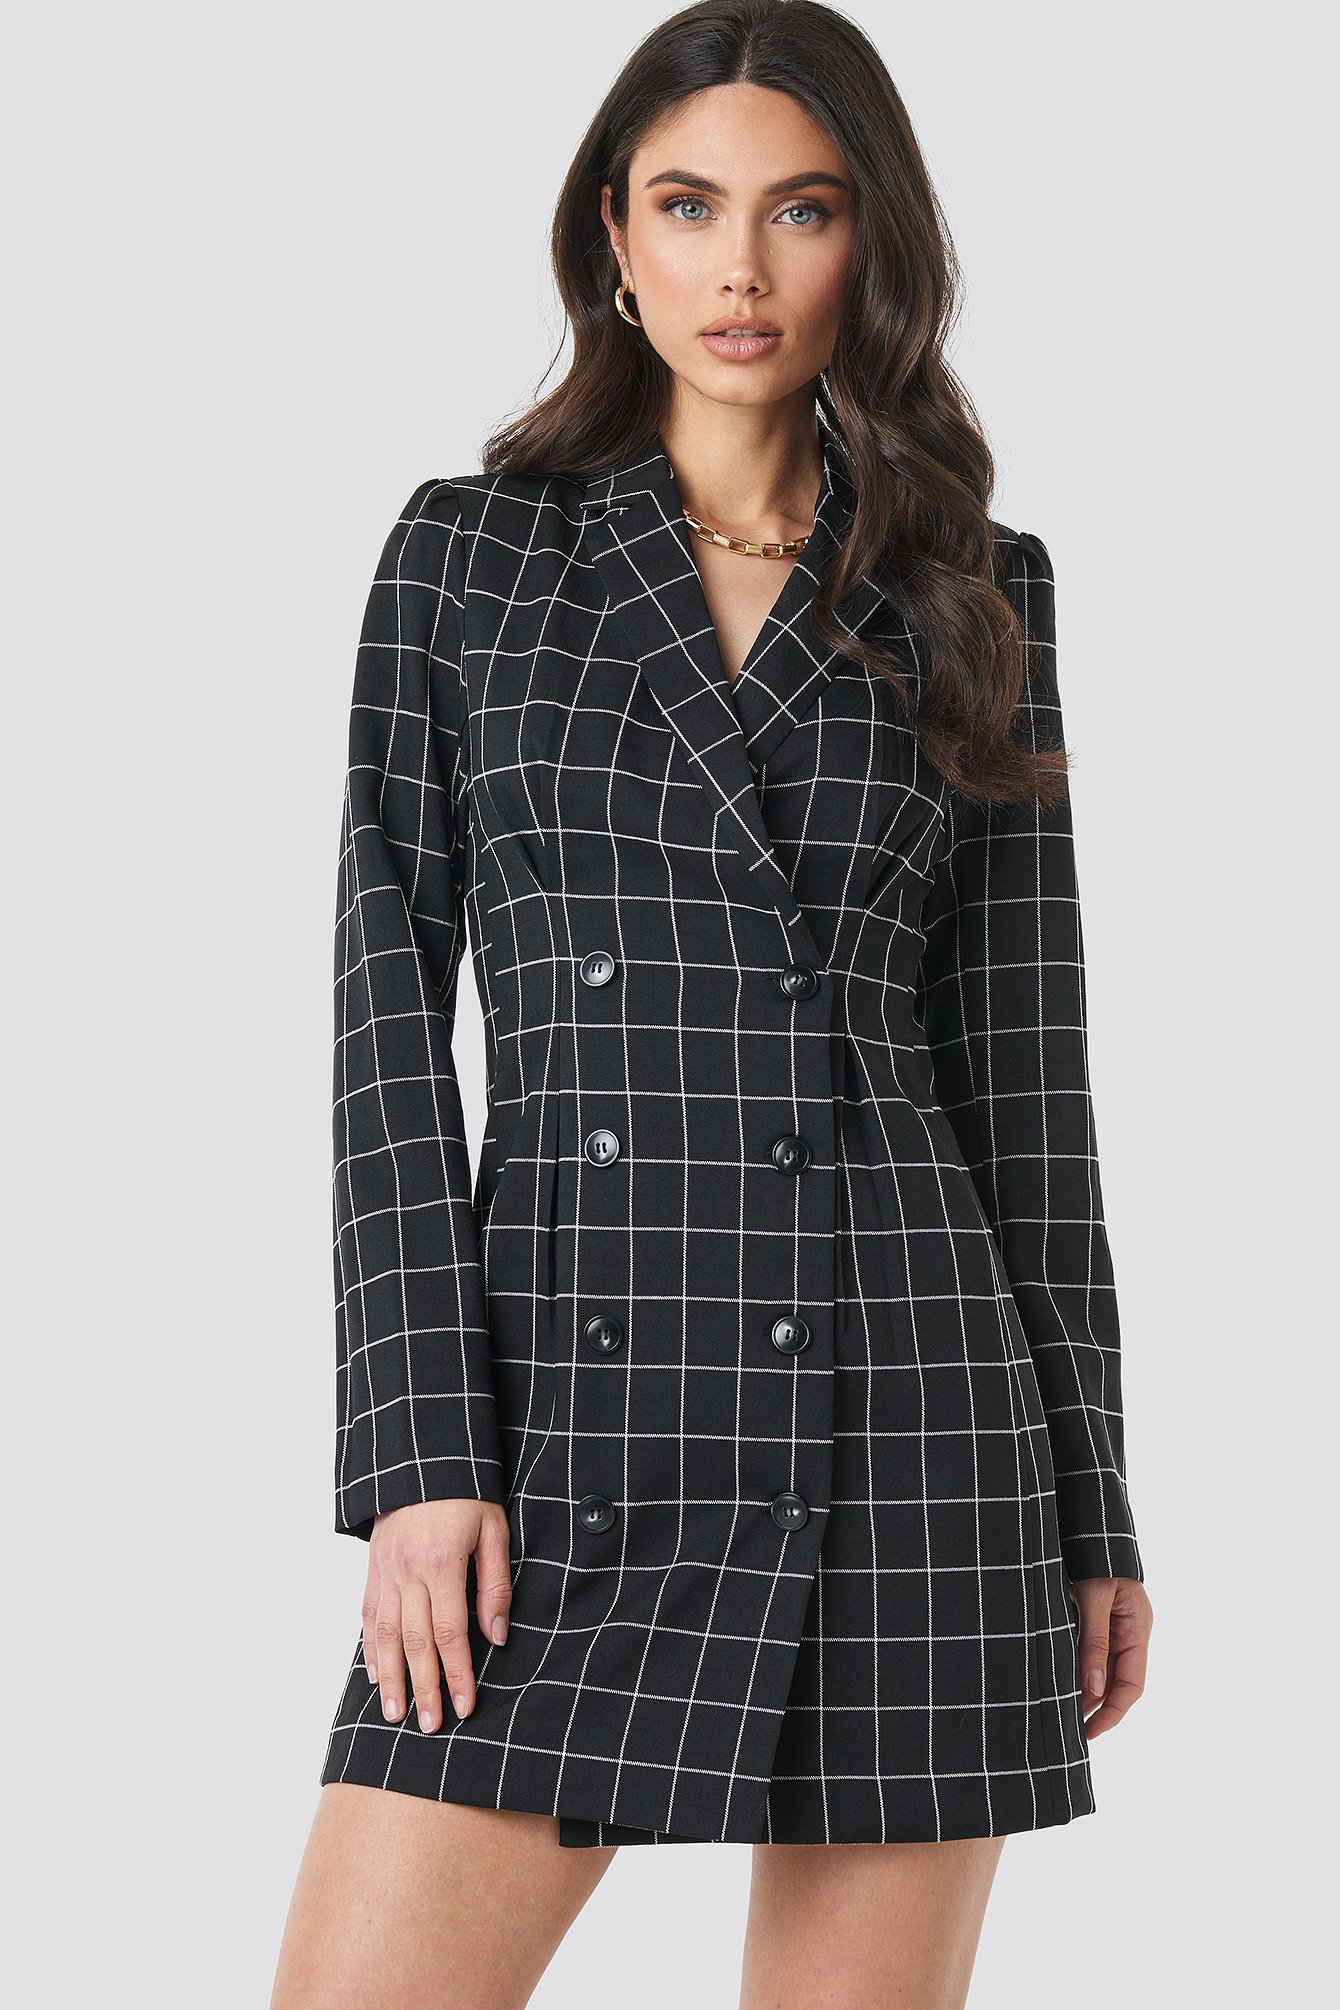 Big Check Blazer Dress Noir by Nakdclassic